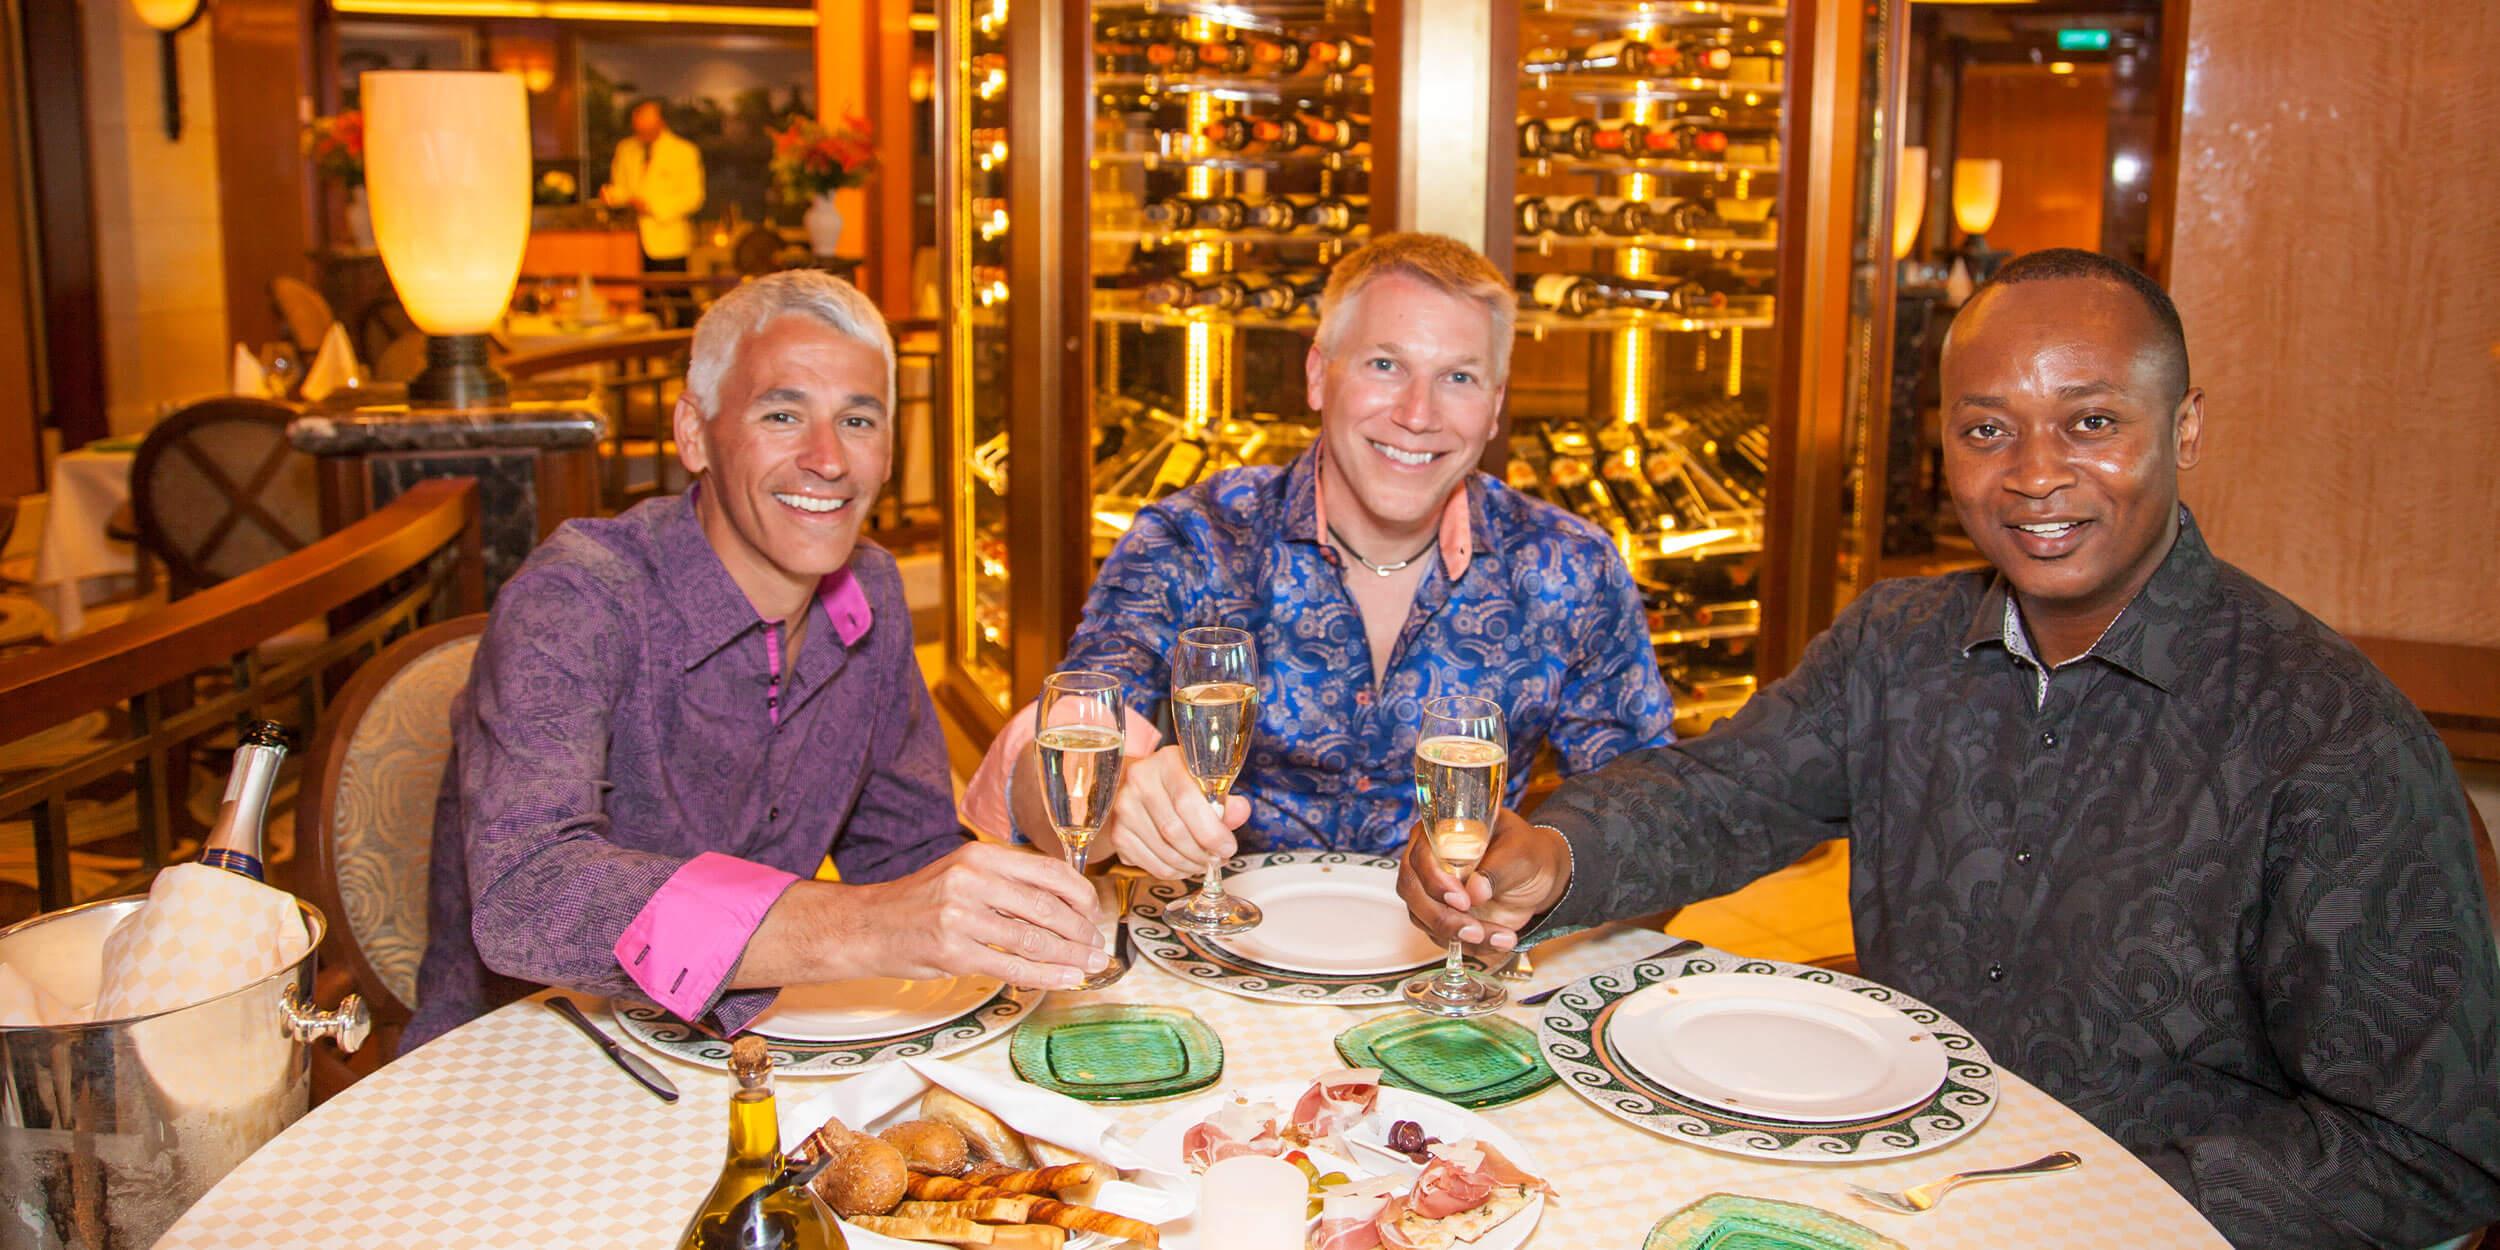 Three men dining and toasting wine